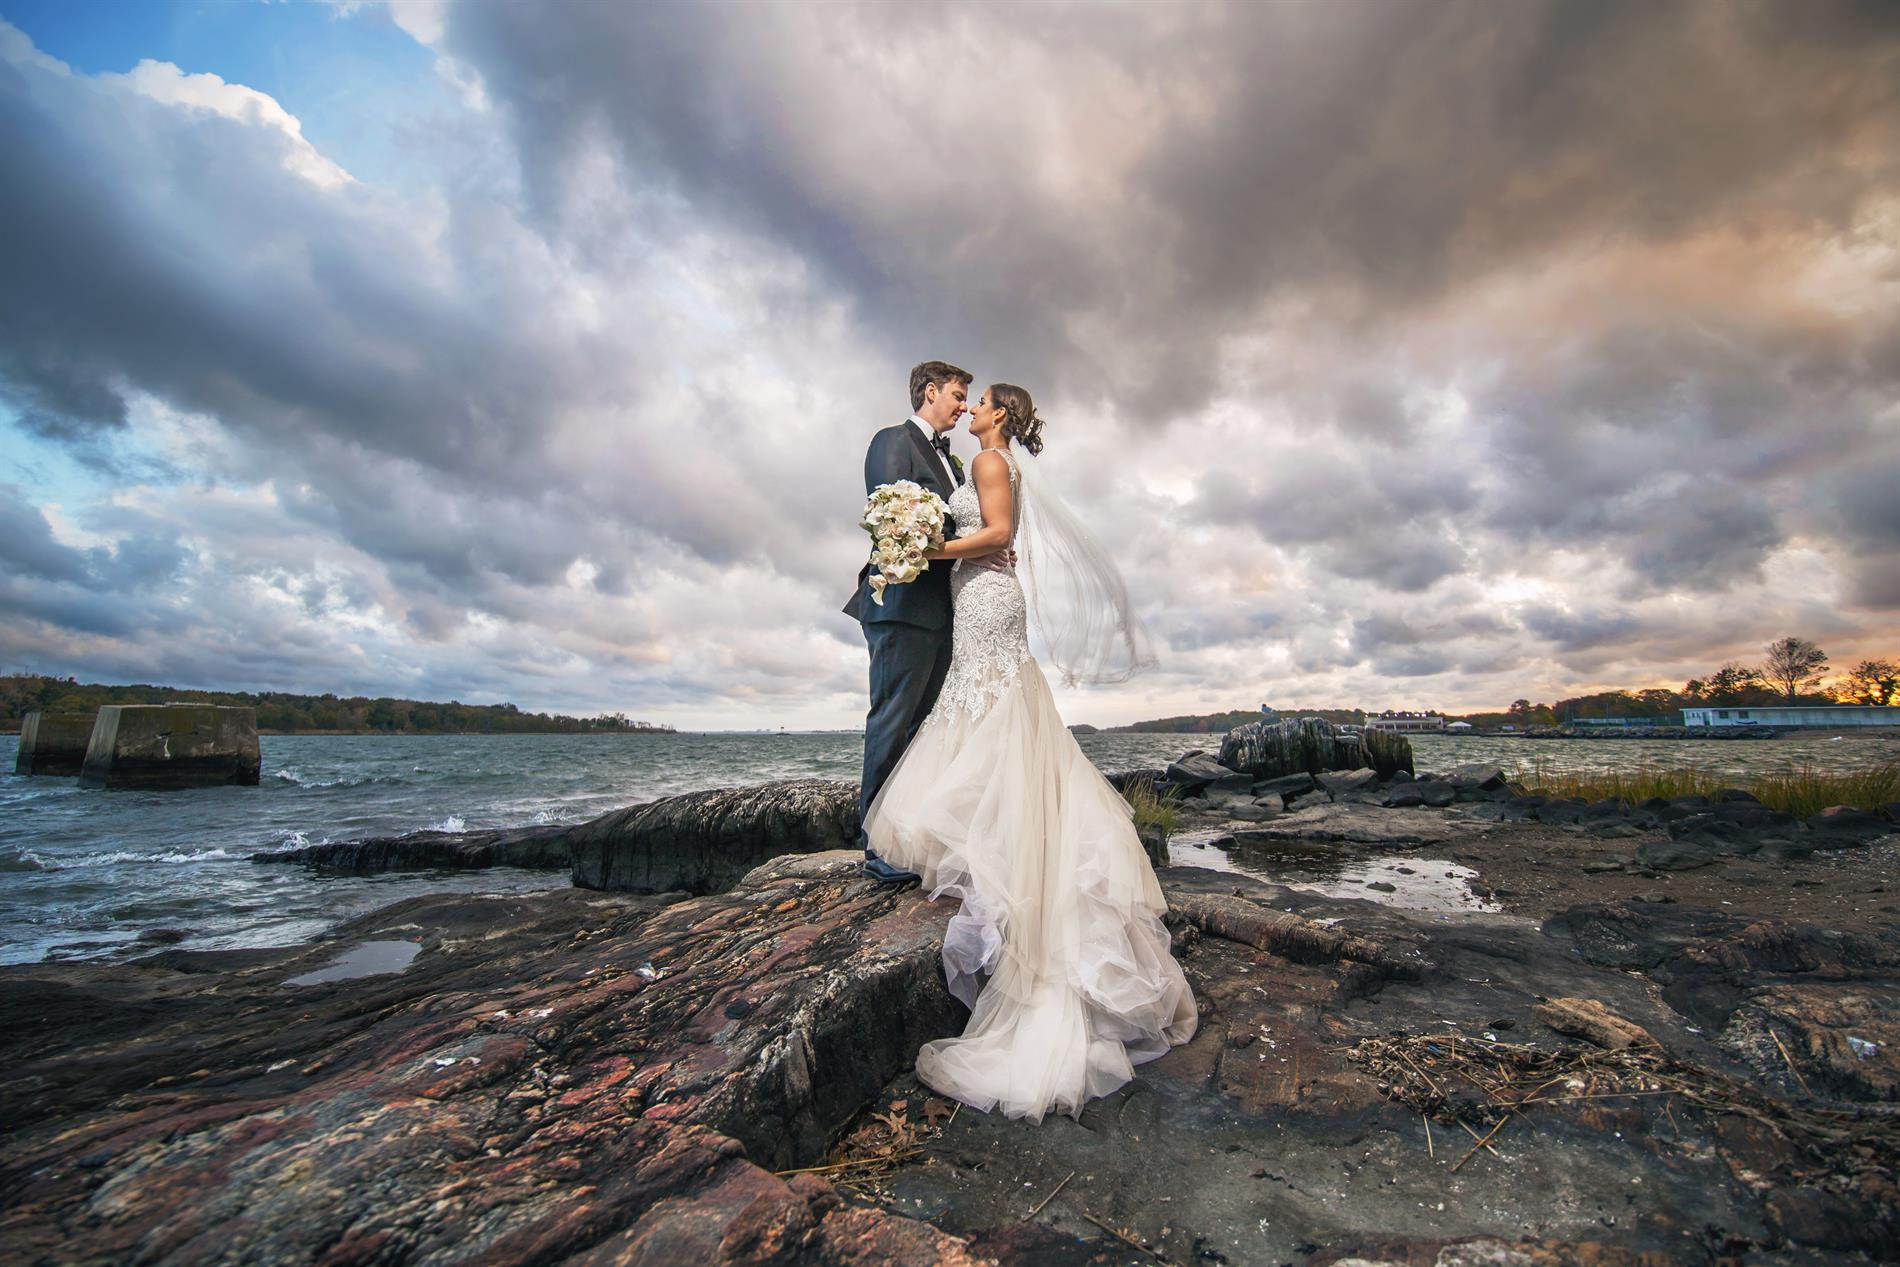 Villamariona Aleksandr Wedding and Engagement Portfolio